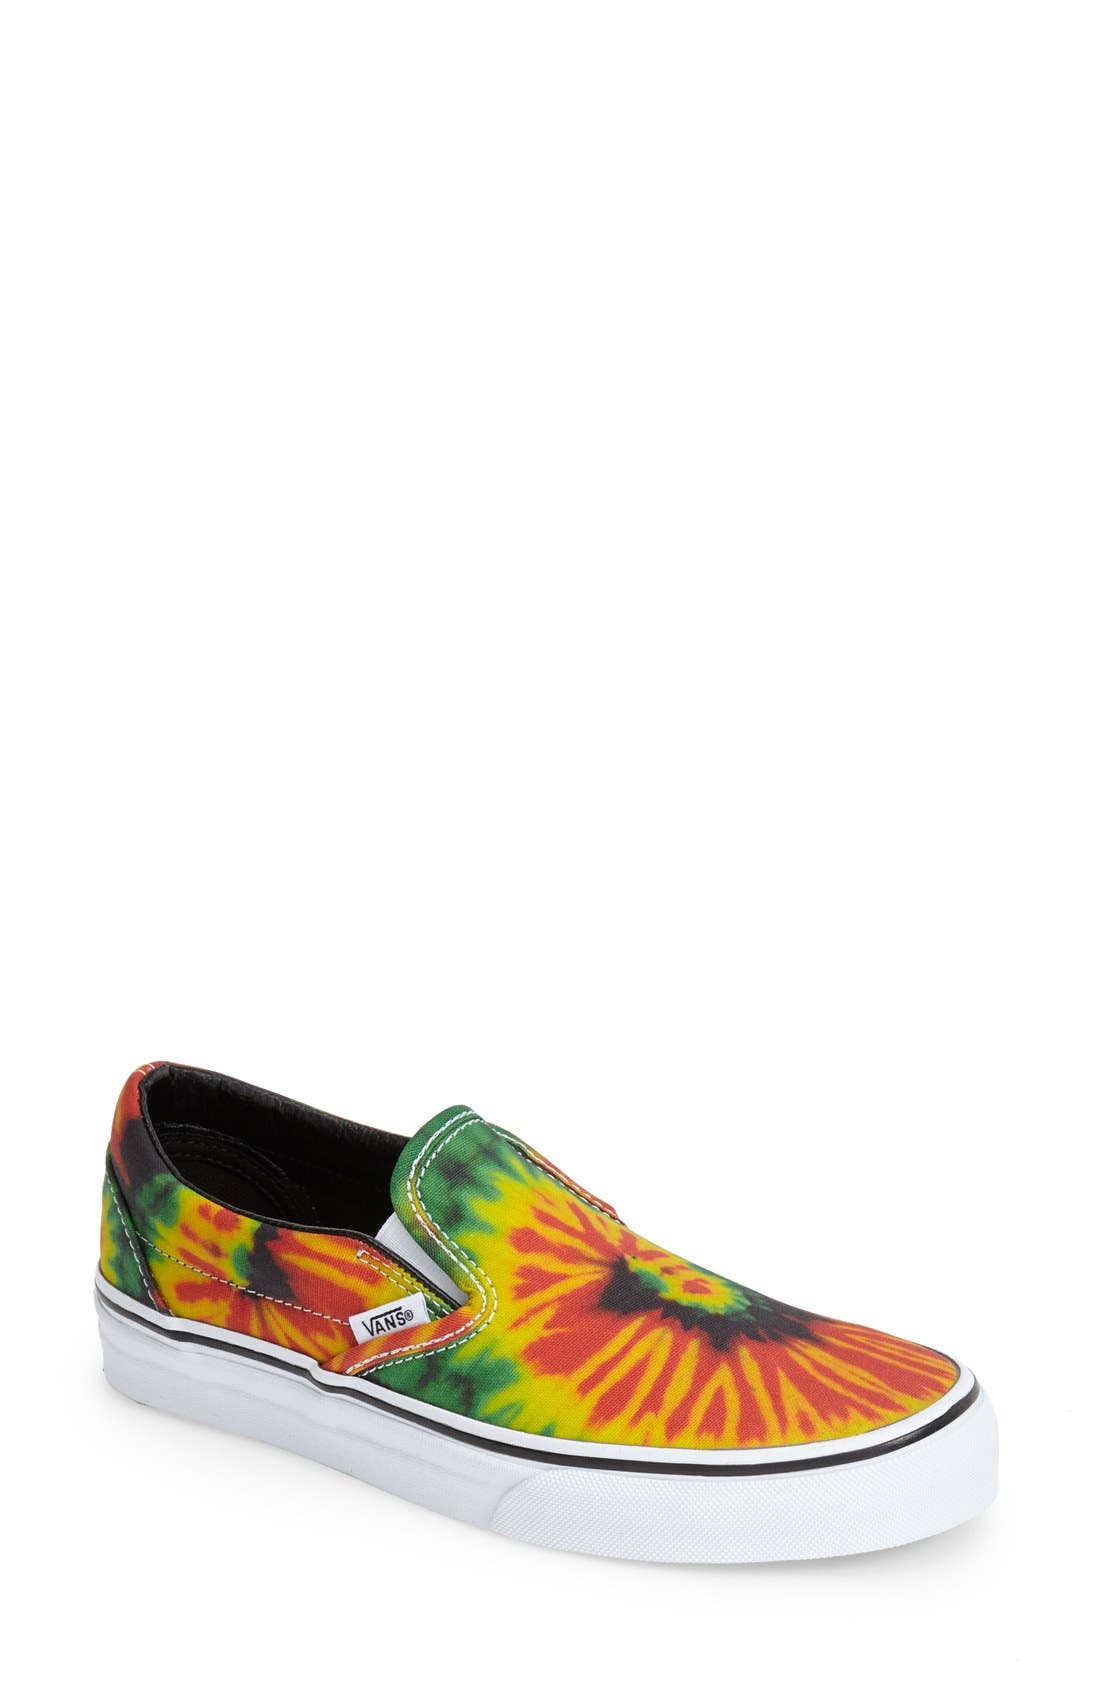 Main Image - Vans 'Tie Dye' Slip-On Sneaker (Women)